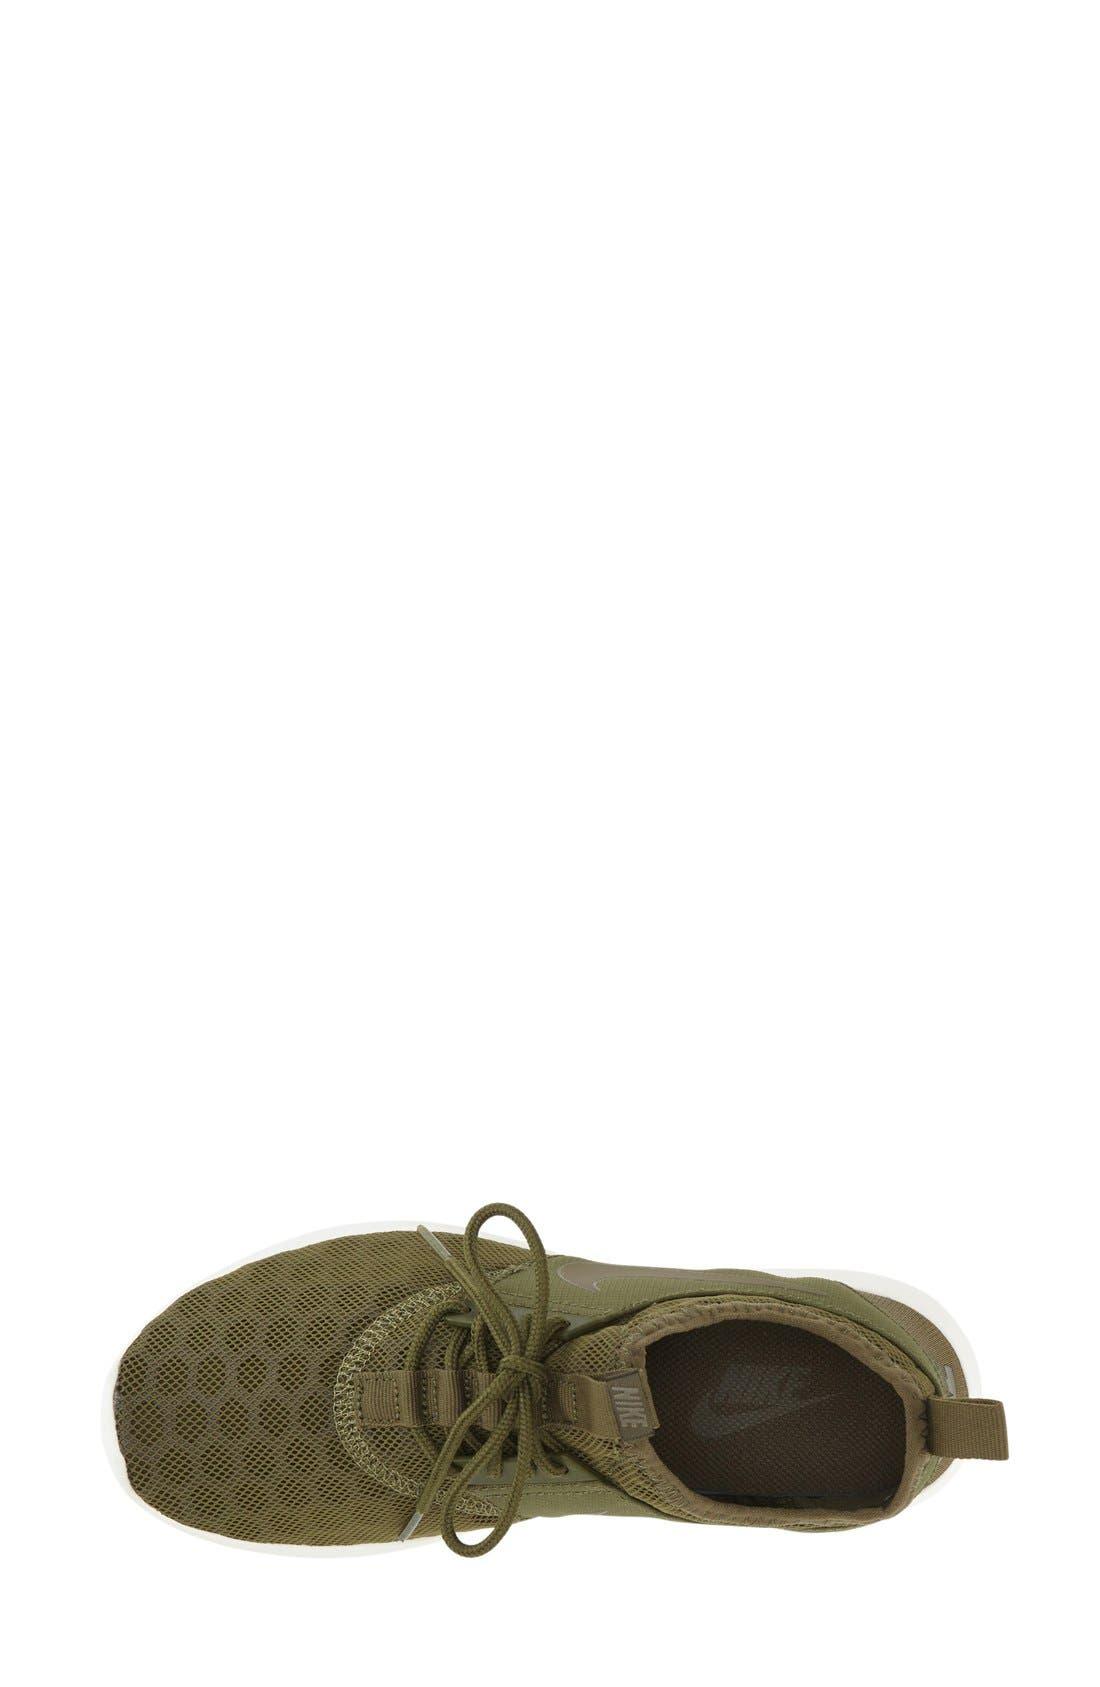 ,                             'Juvenate' Sneaker,                             Alternate thumbnail 138, color,                             300